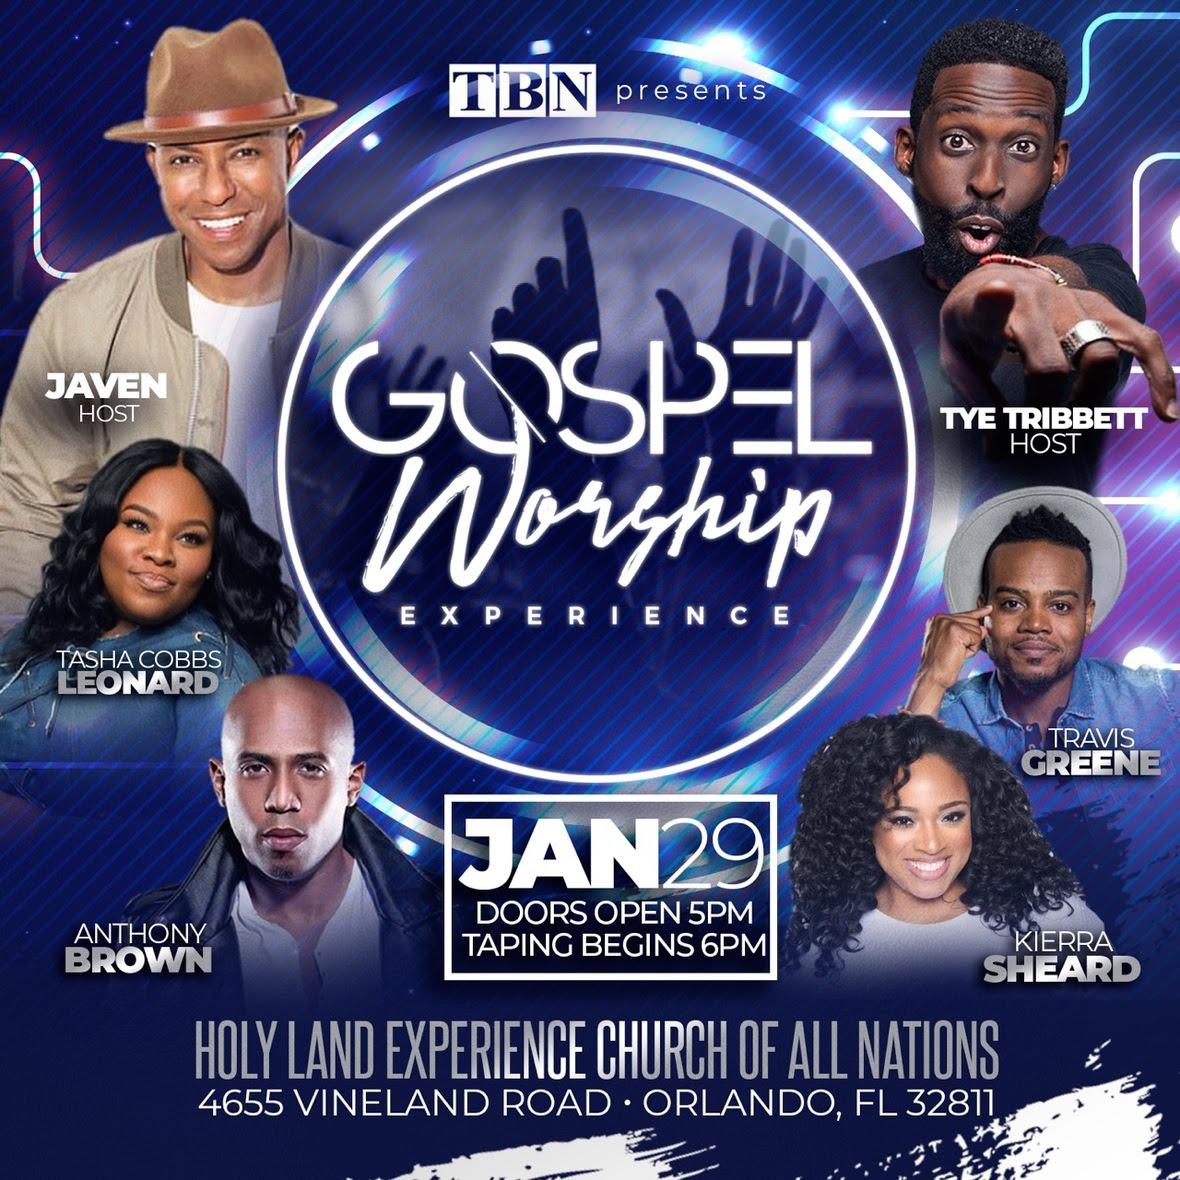 Tye Tribbett _ Gospel Worship Experience